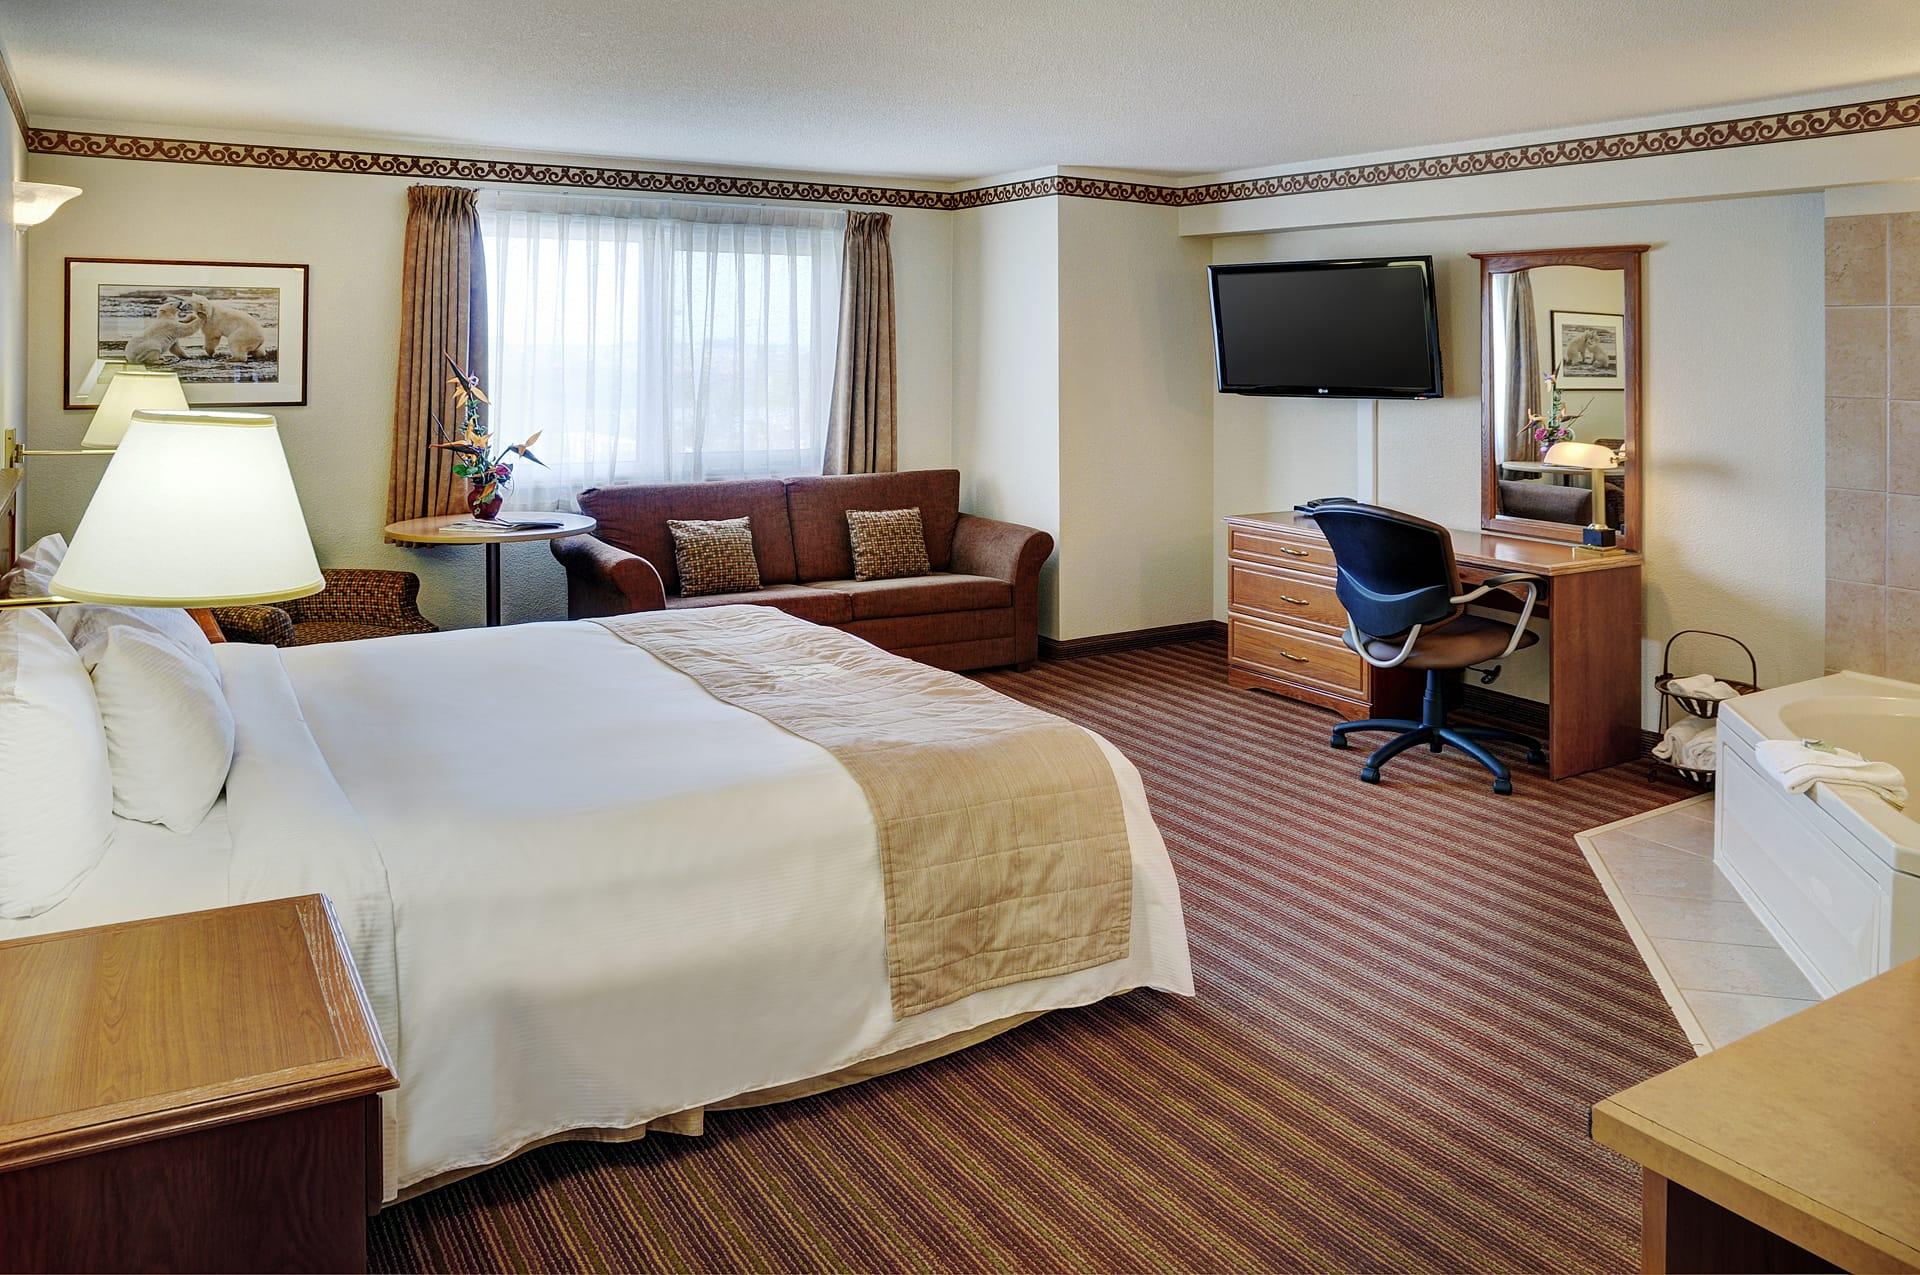 Lakeview Inns & Suites - Brandon - Hotel Room